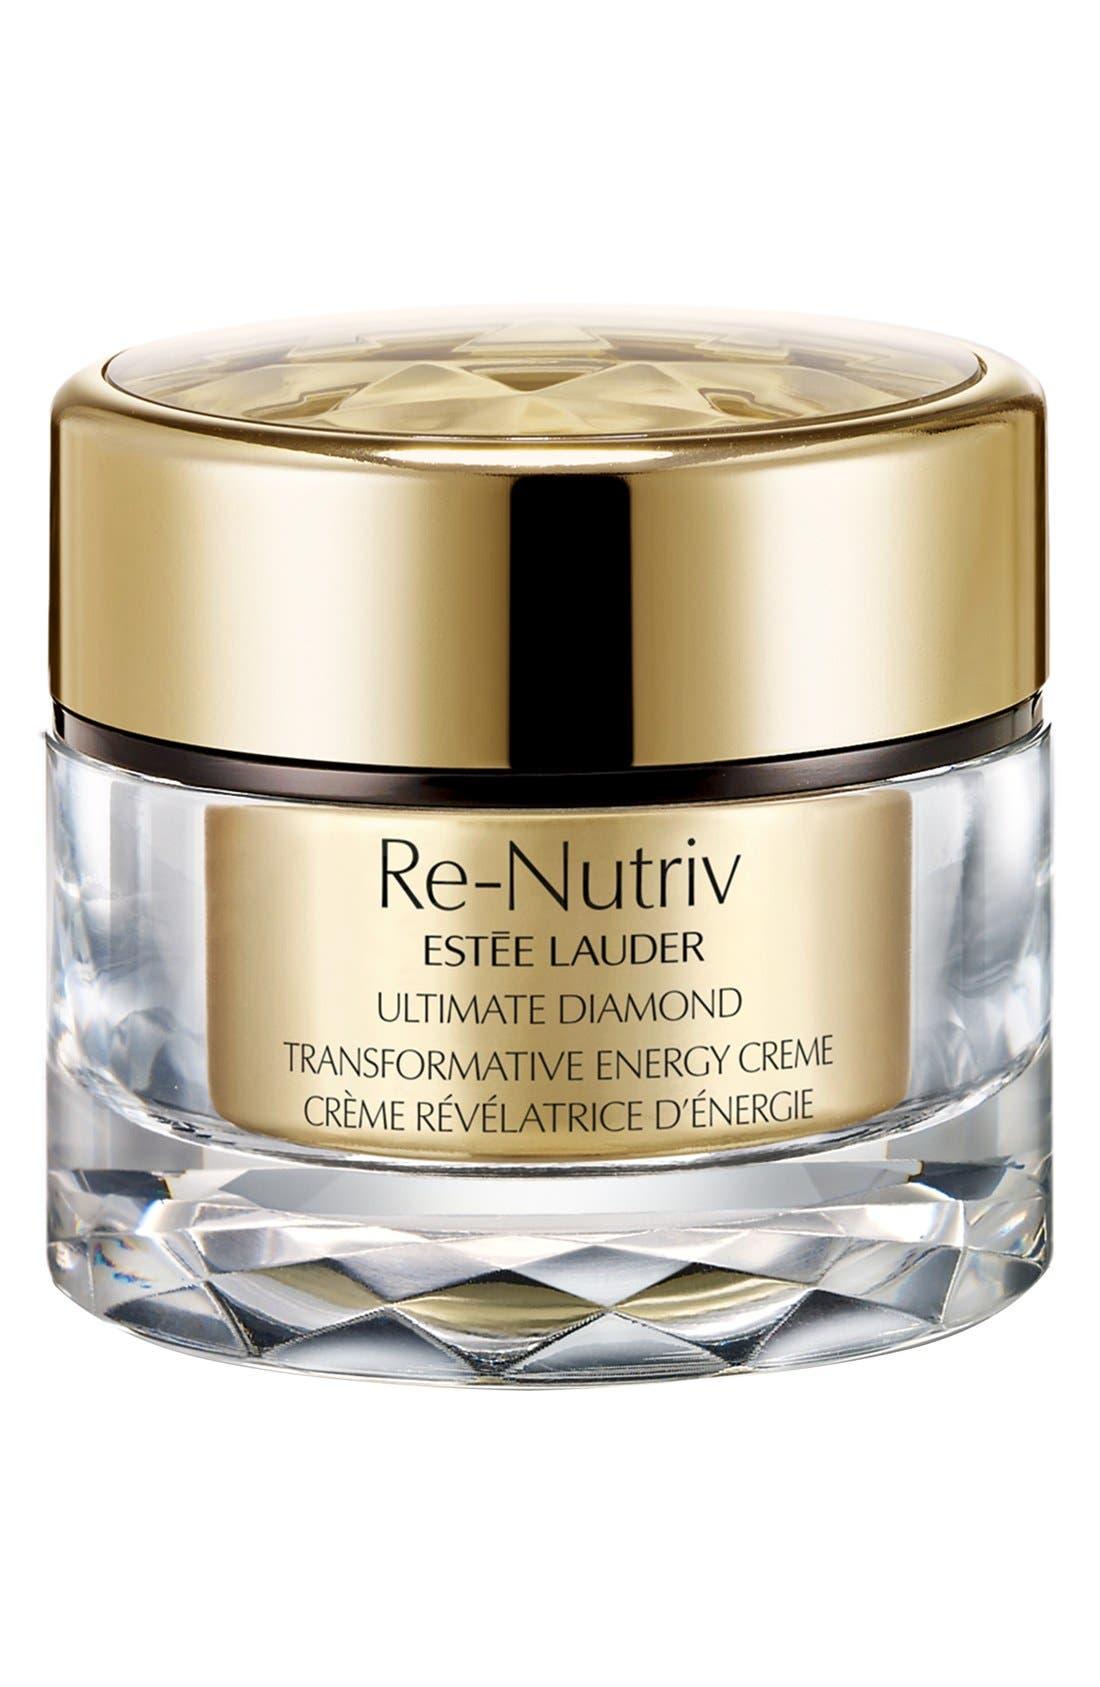 Re-Nutriv Ultimate Diamond Transformative Energy Face Cream